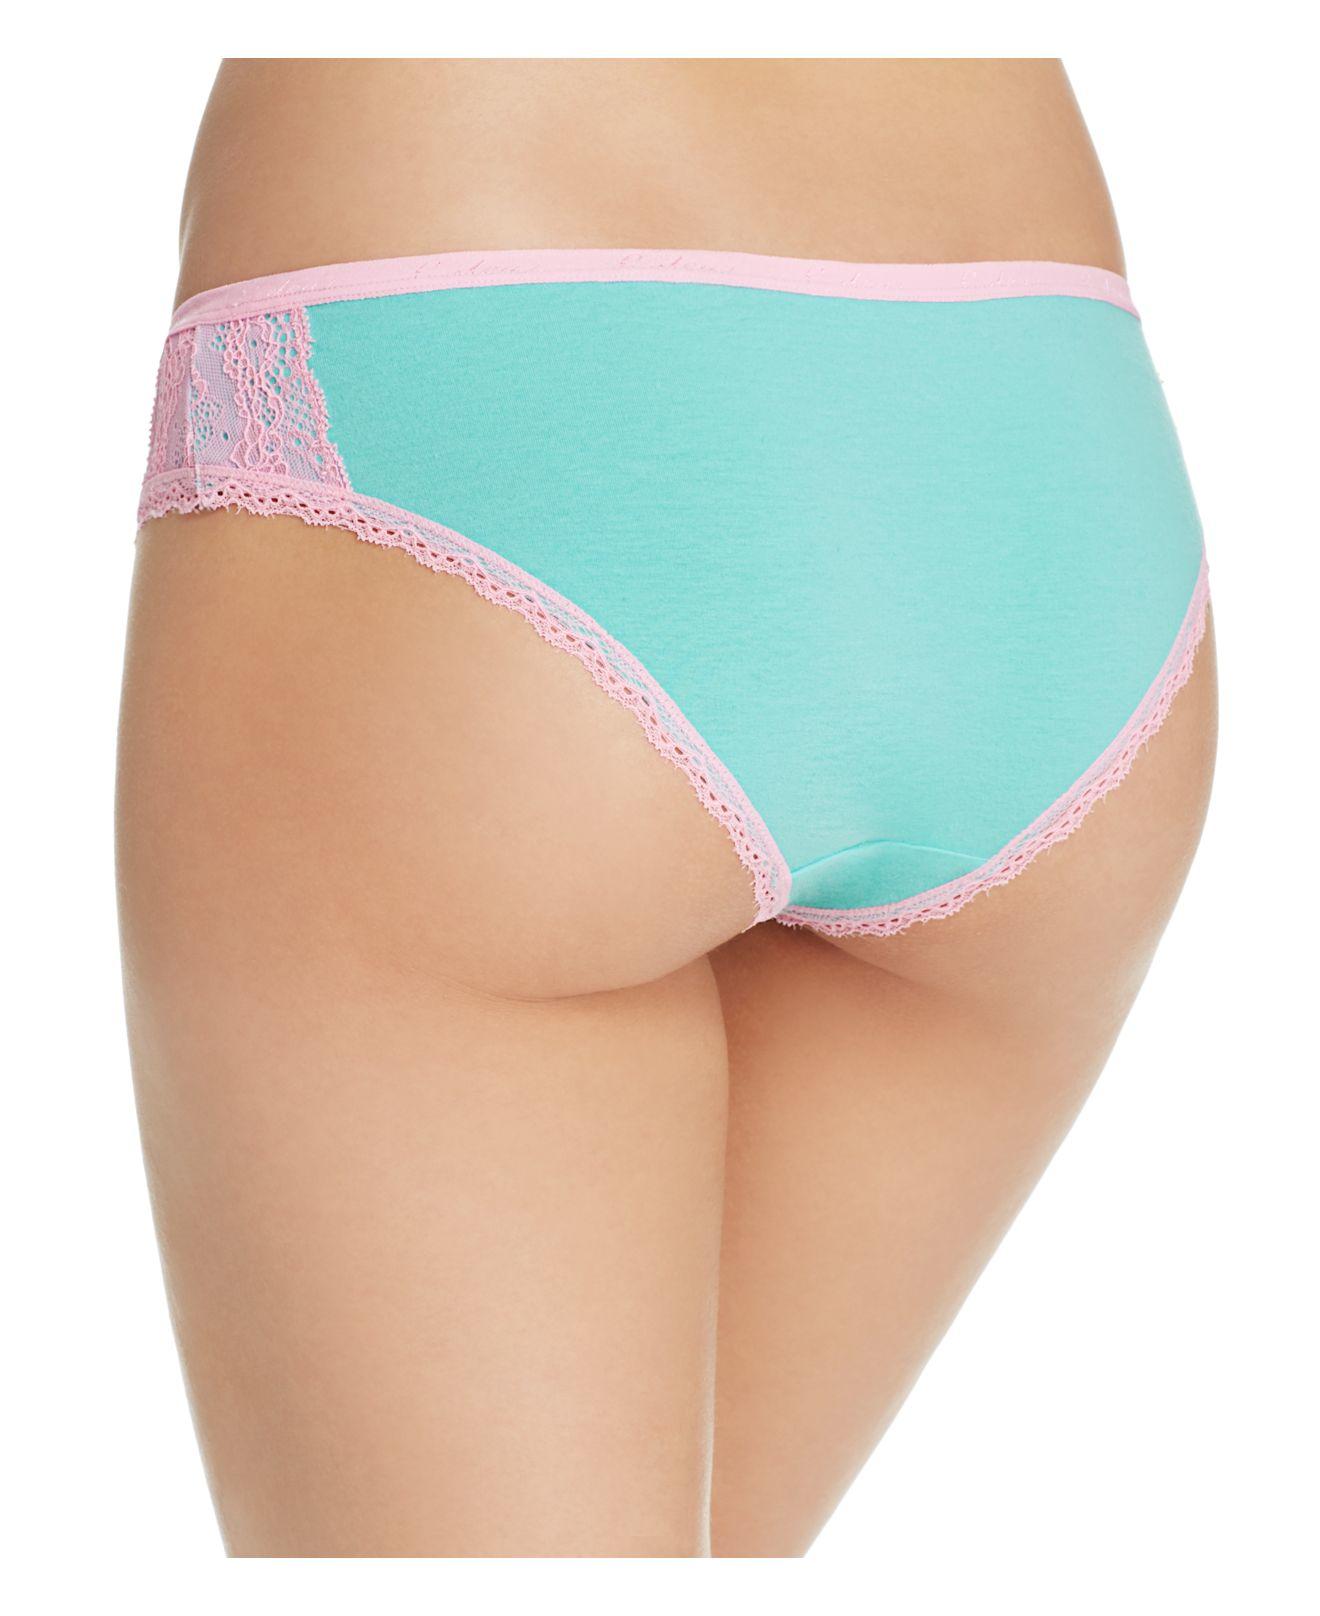 Lyst Honeydew Intimates Jessi Cotton Bikini 590400b In Blue